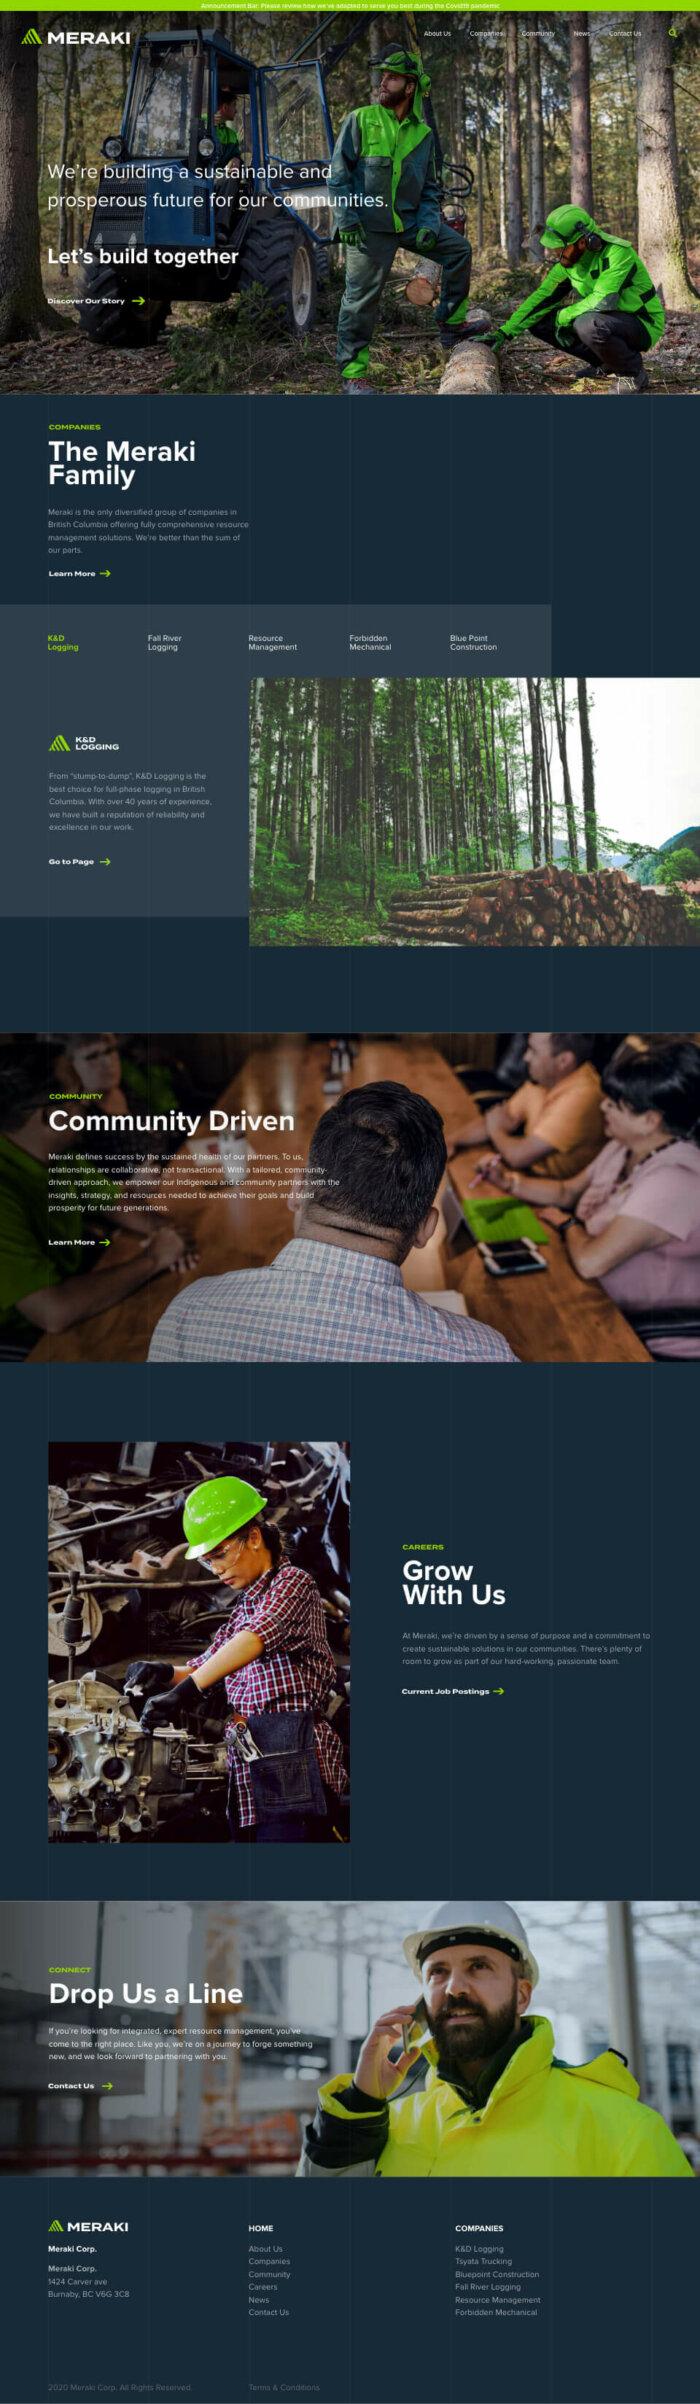 Homepage design from Meraki Resource website project